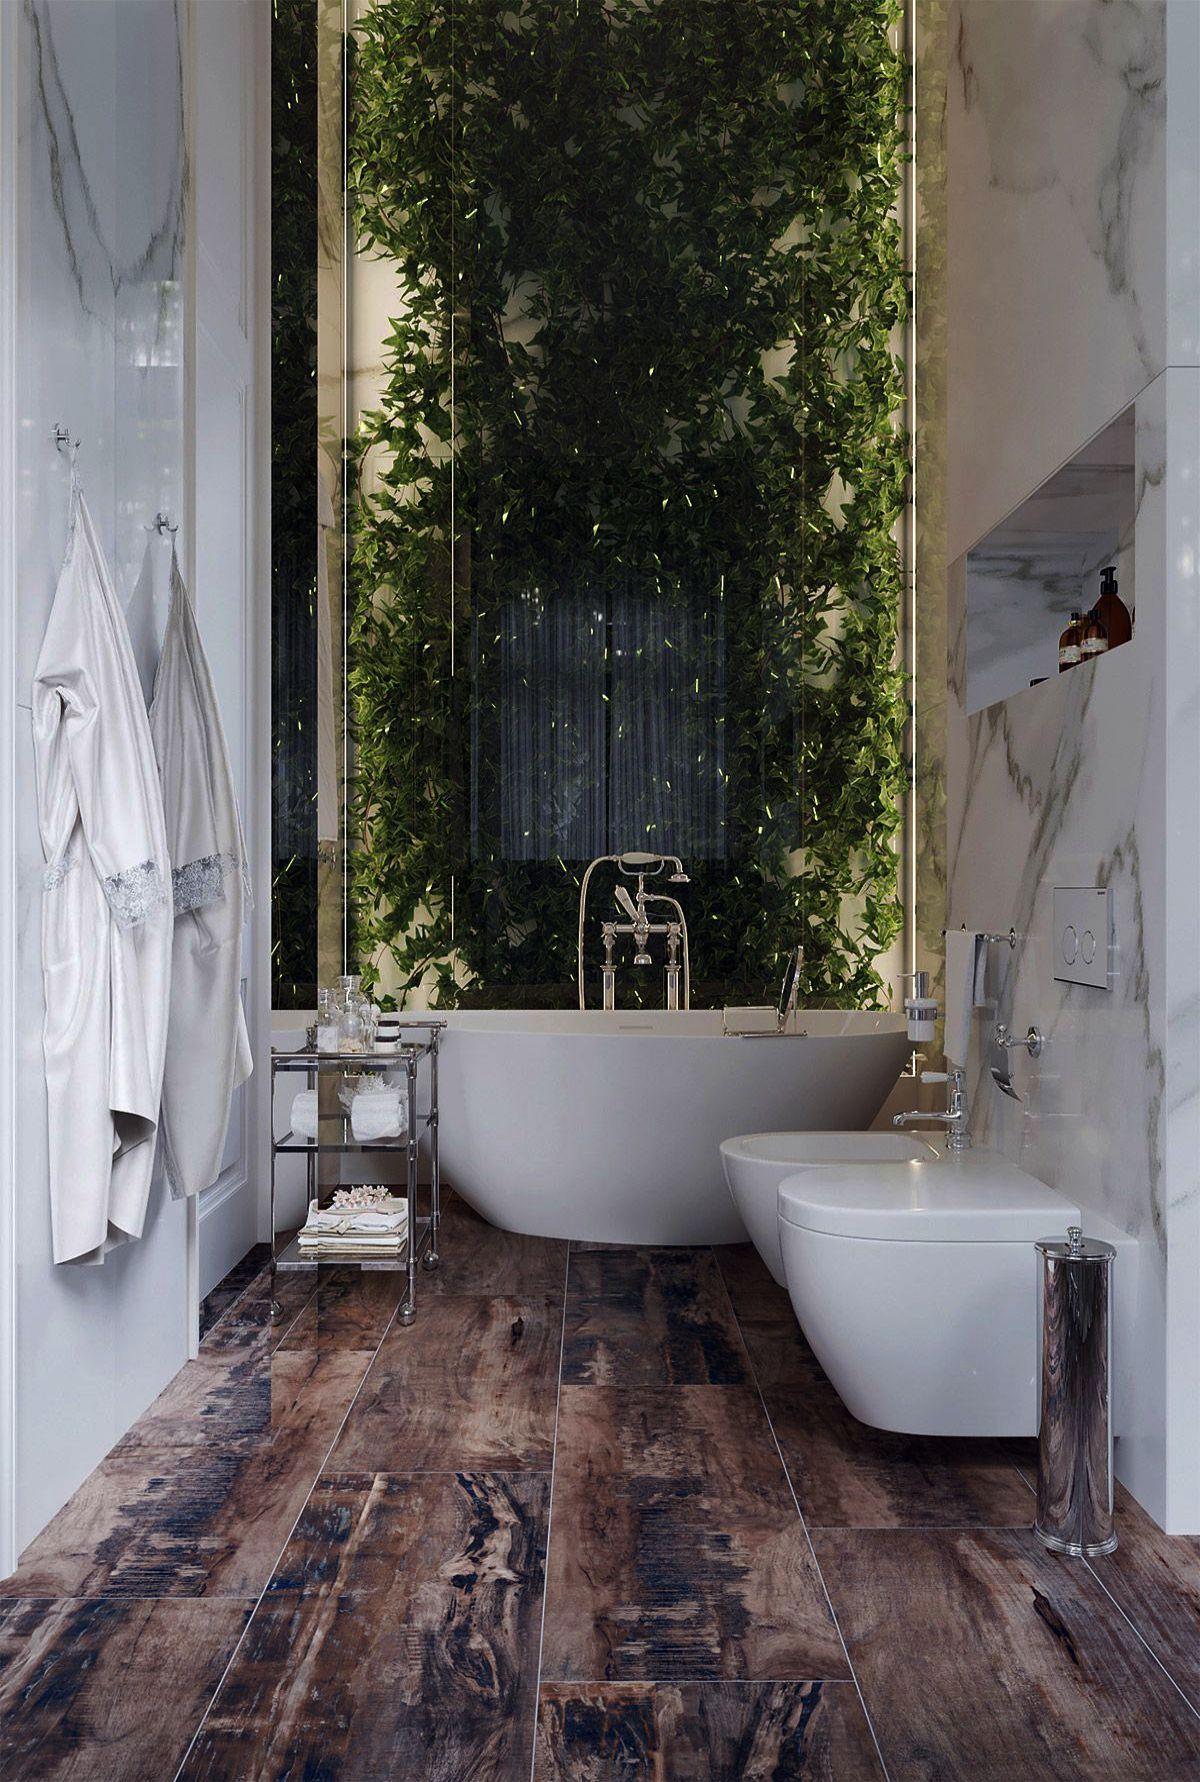 Bathroom Shower Design Ideas Pictures your Bathroom Tiles